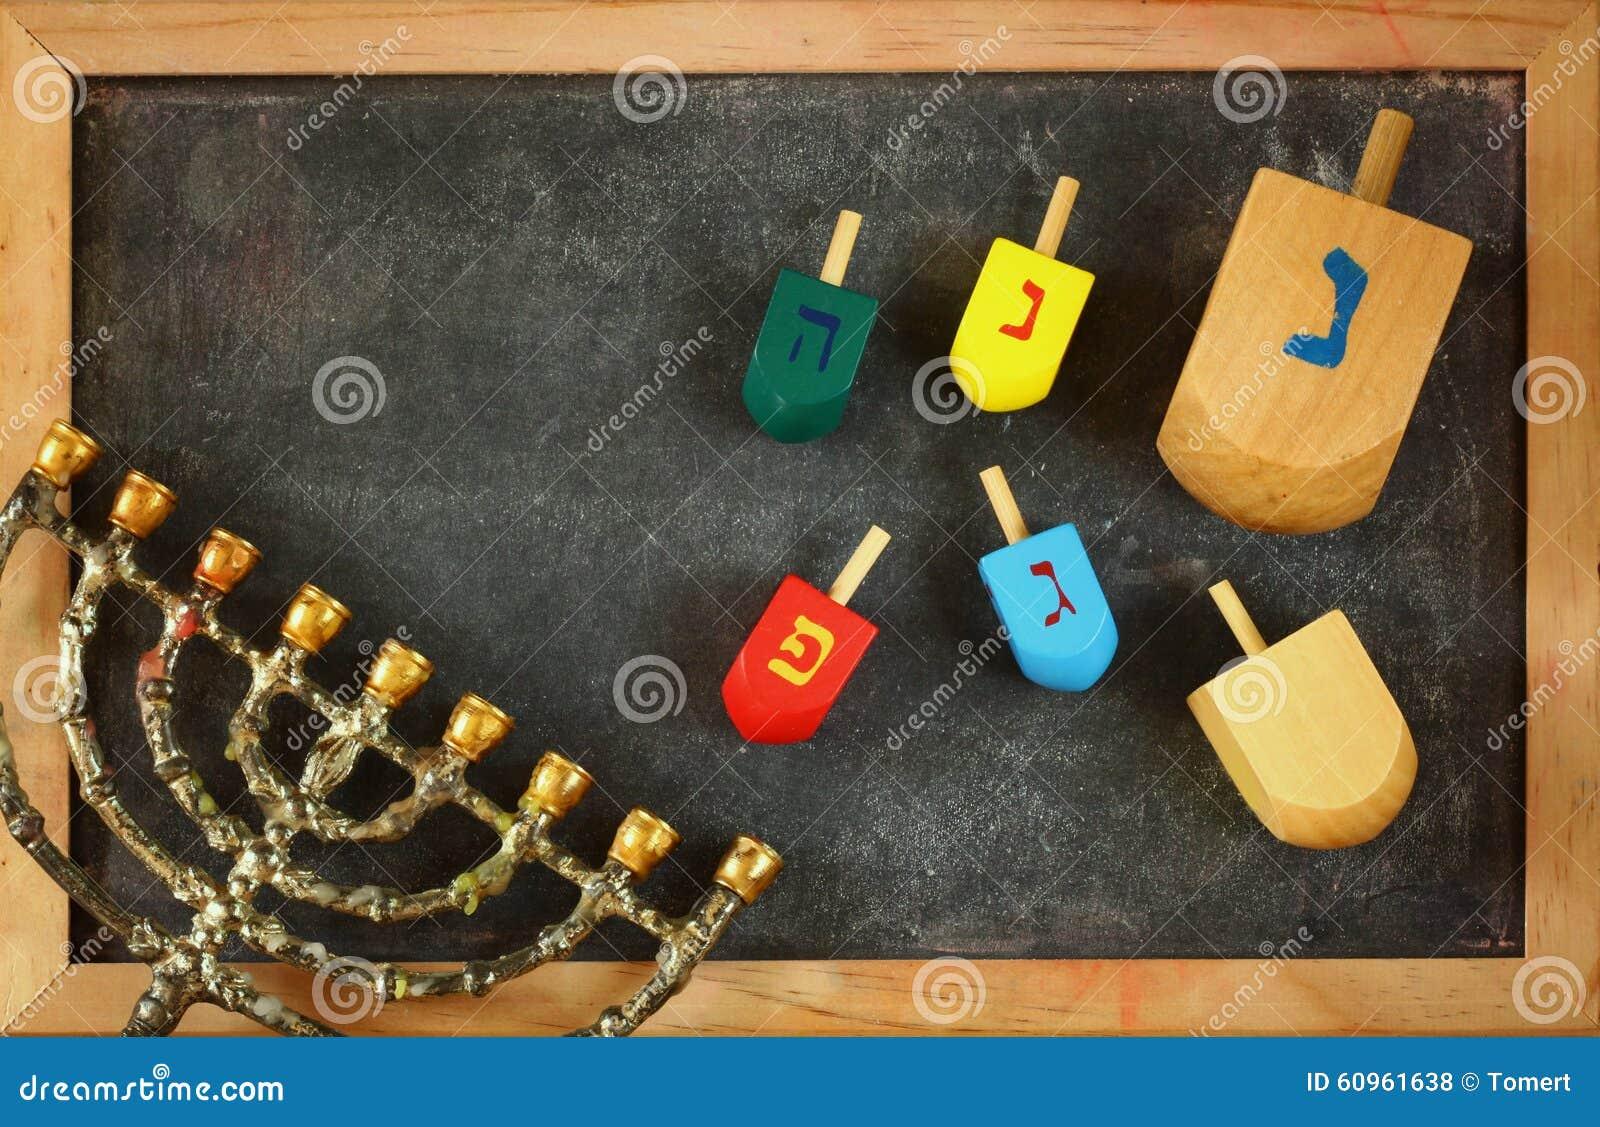 Image of jewish holiday Hanukkah.